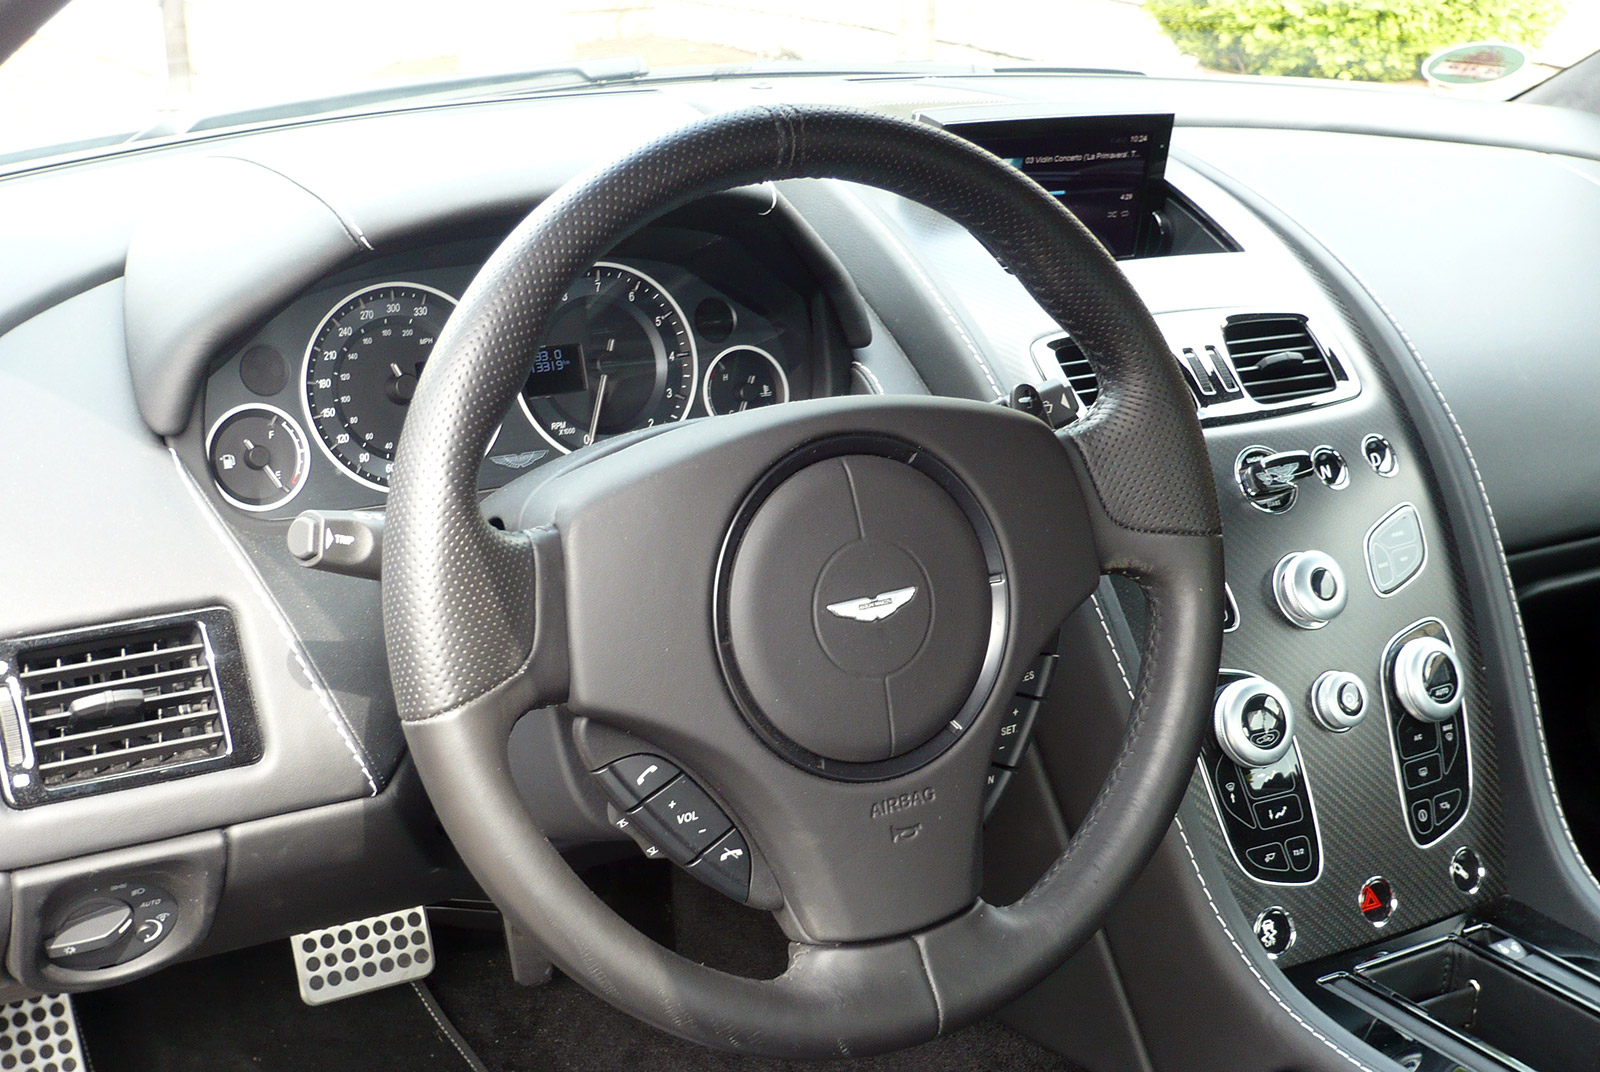 AM-2995-Aston-Martin_V12-Vantage-S_Grau_Schwarz_07